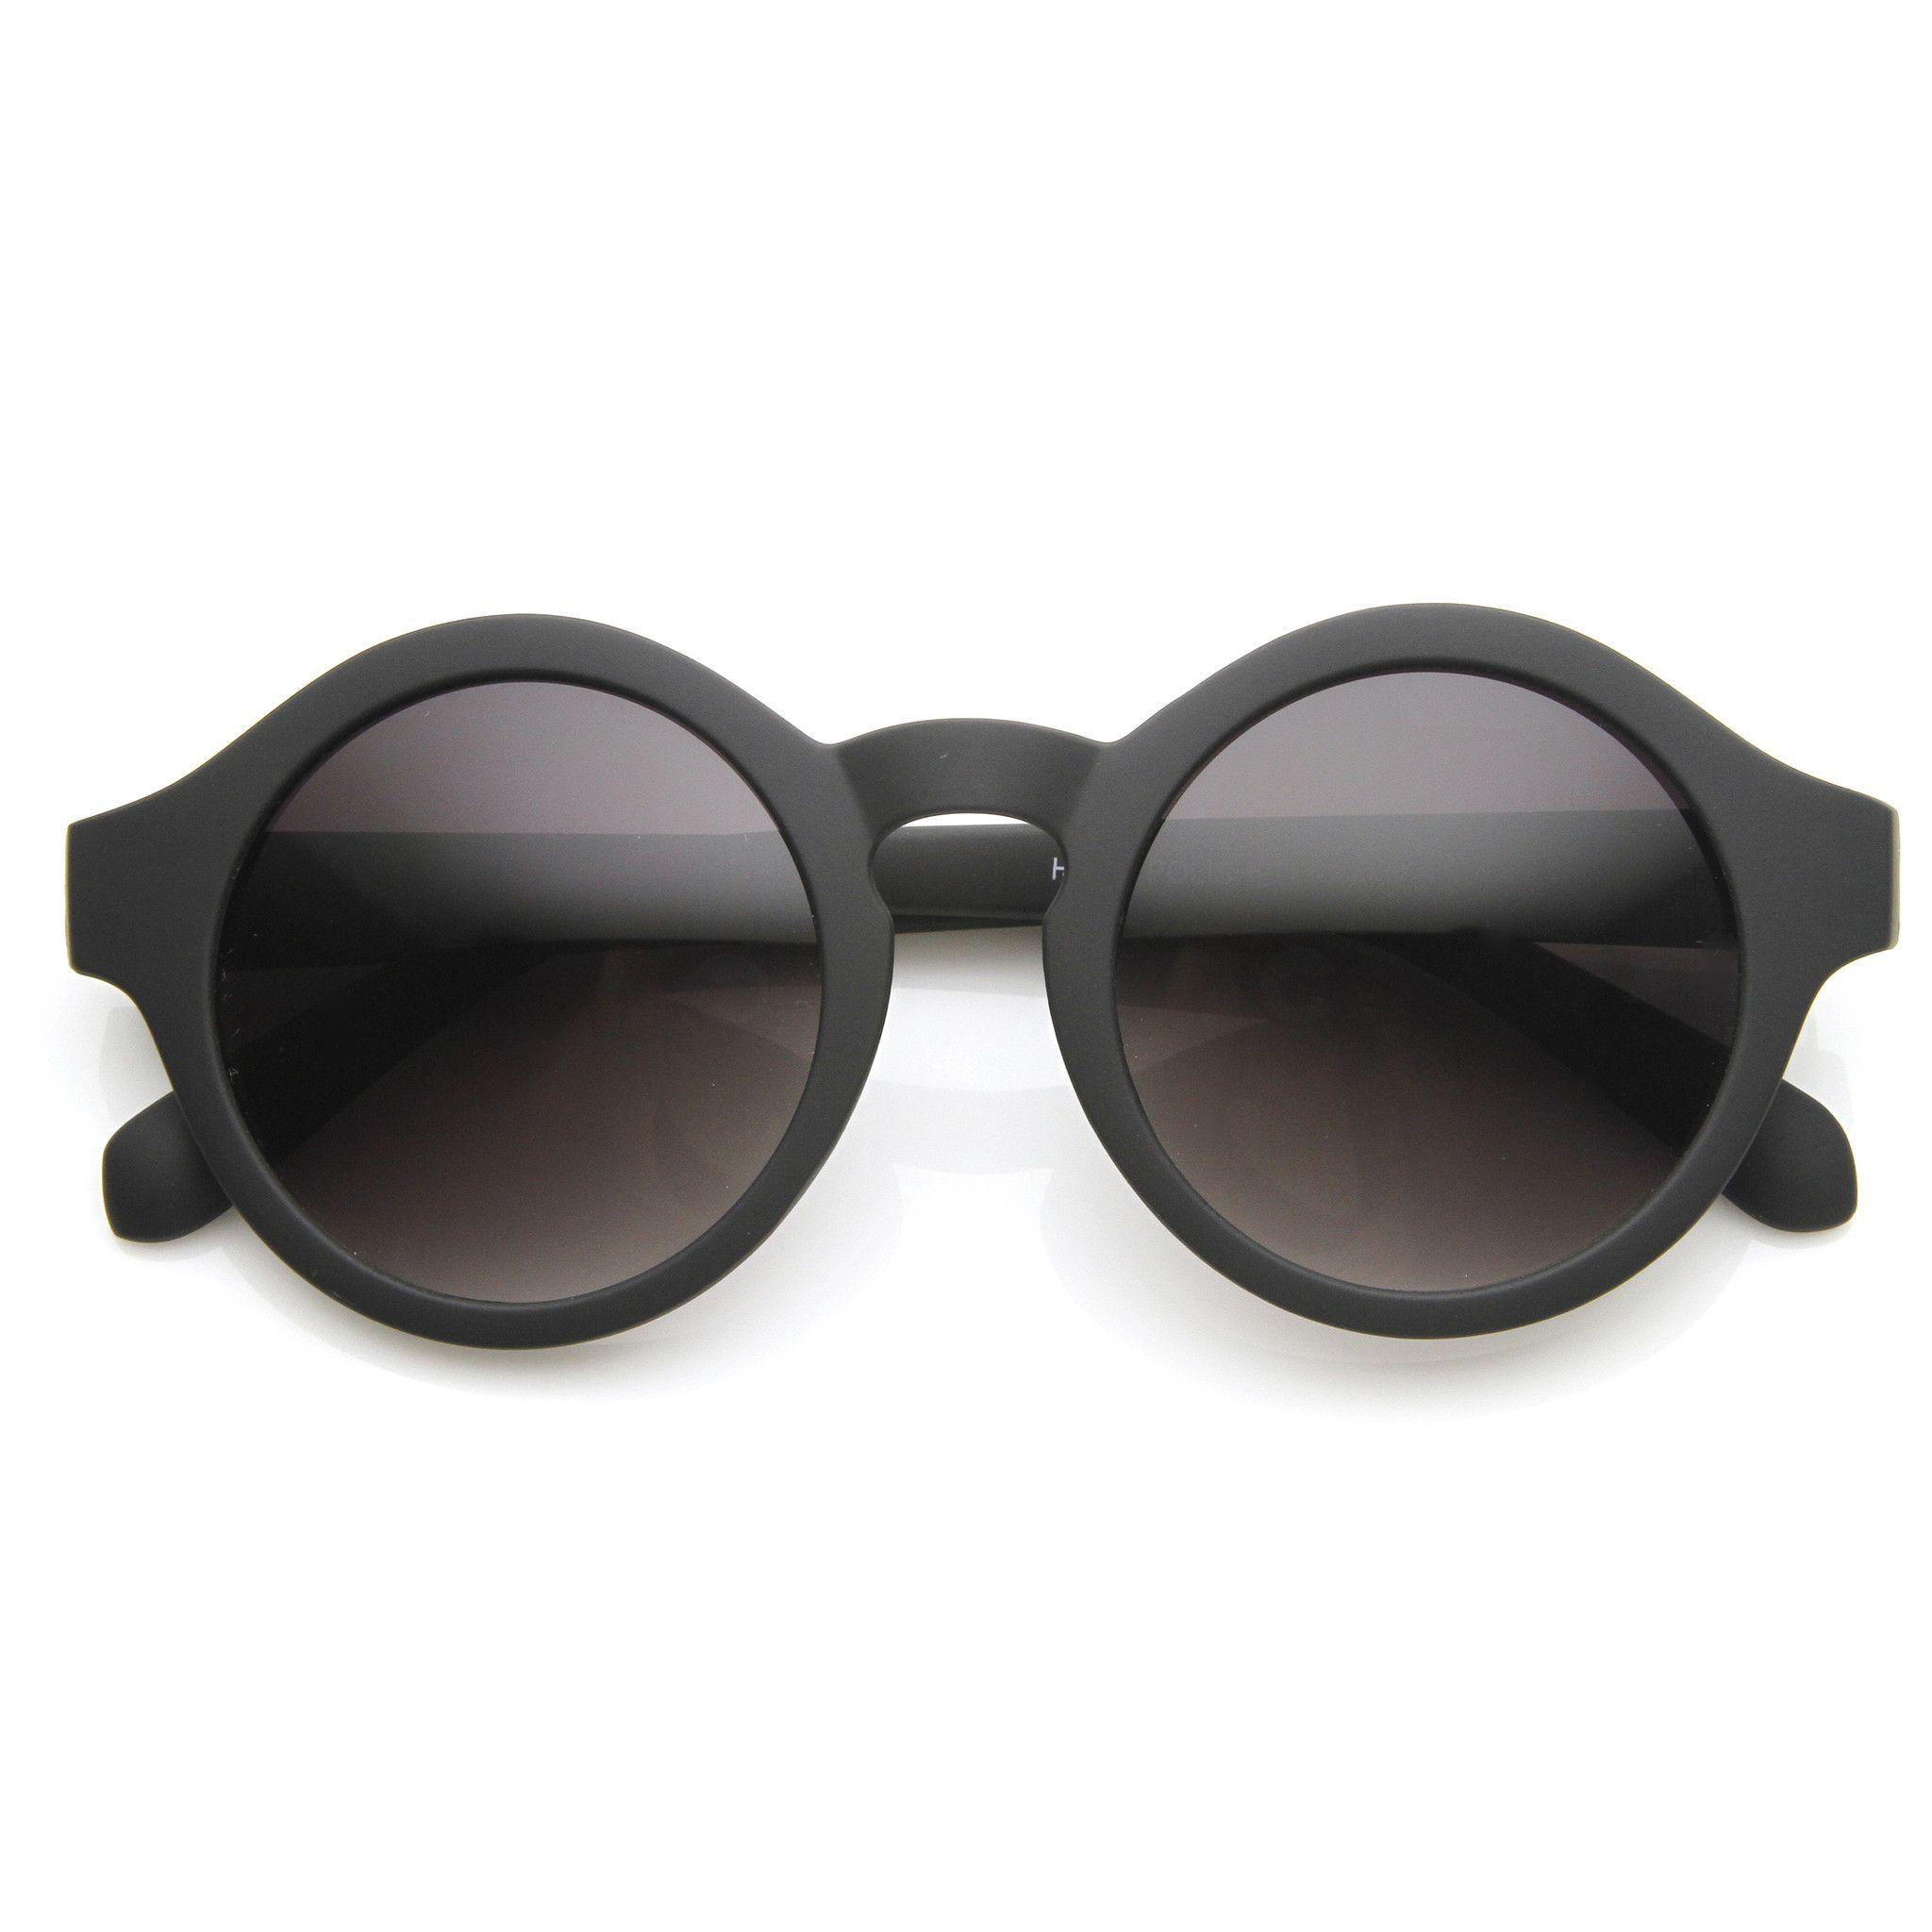 Classic Retro Keyhole Round P3 Frame Sunglasses 9196 | Mode, Oakley ...